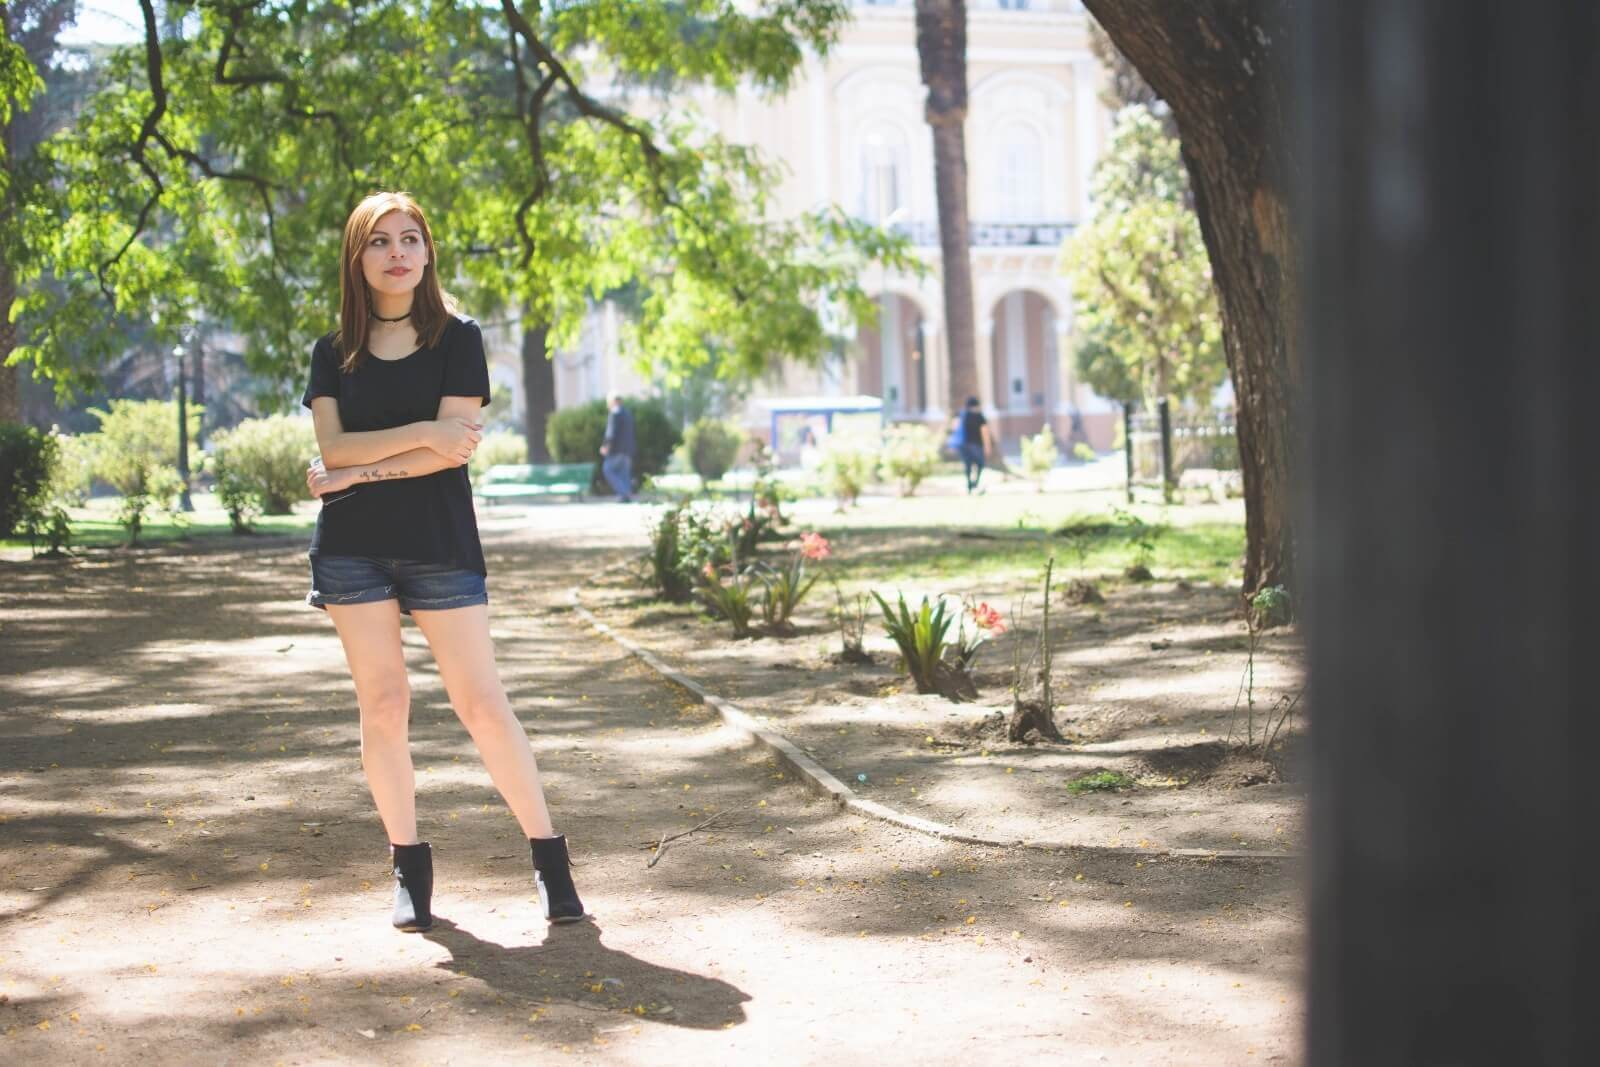 black-tshirt-jeans-california-girl-outfit-ankle-booties-summer-in-black-deborah-ferrero-style-by-deb05